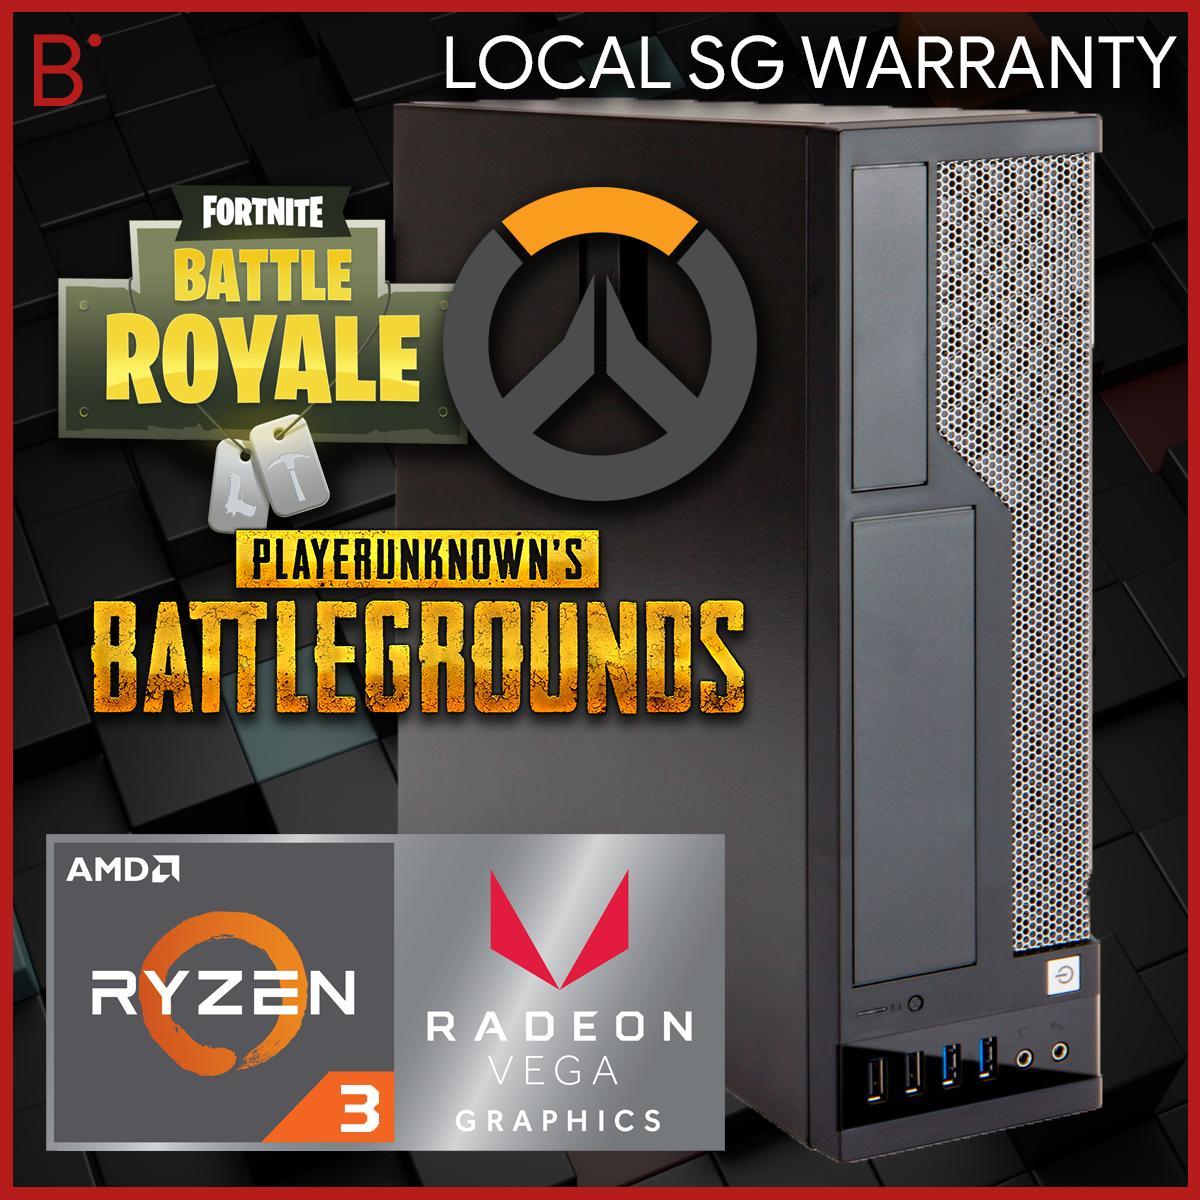 Ryzen 3, Vega Graphics, Gaming Capable, 1TB, Small Form Factor Desktop